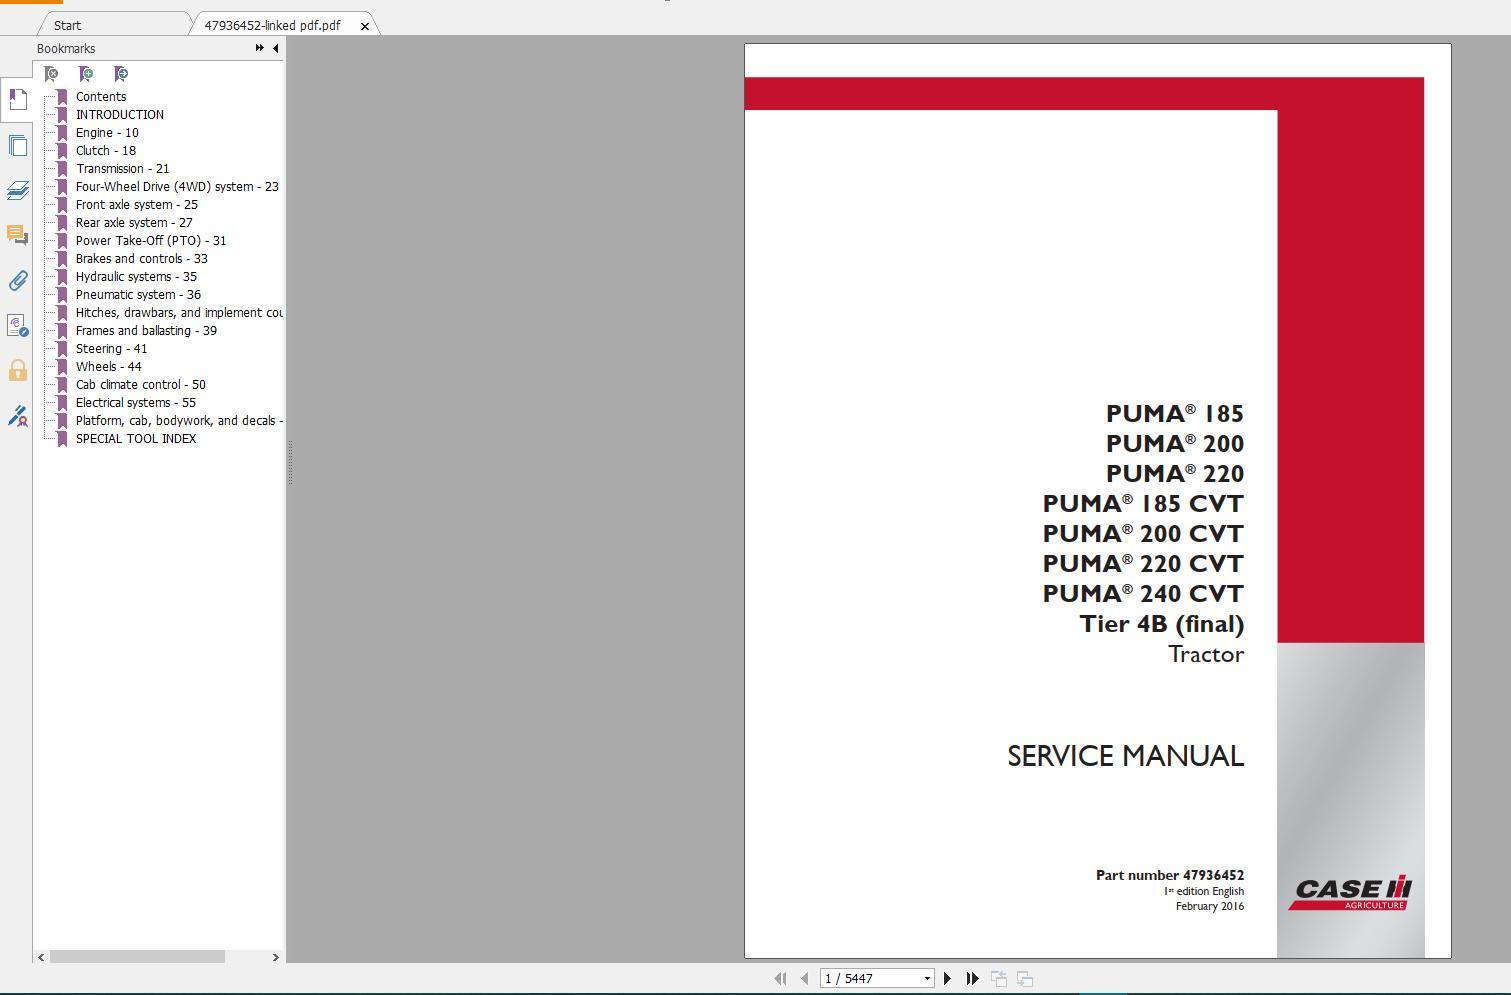 Case_Machine_New_Model_Service_Manual_Full_DVD_20191